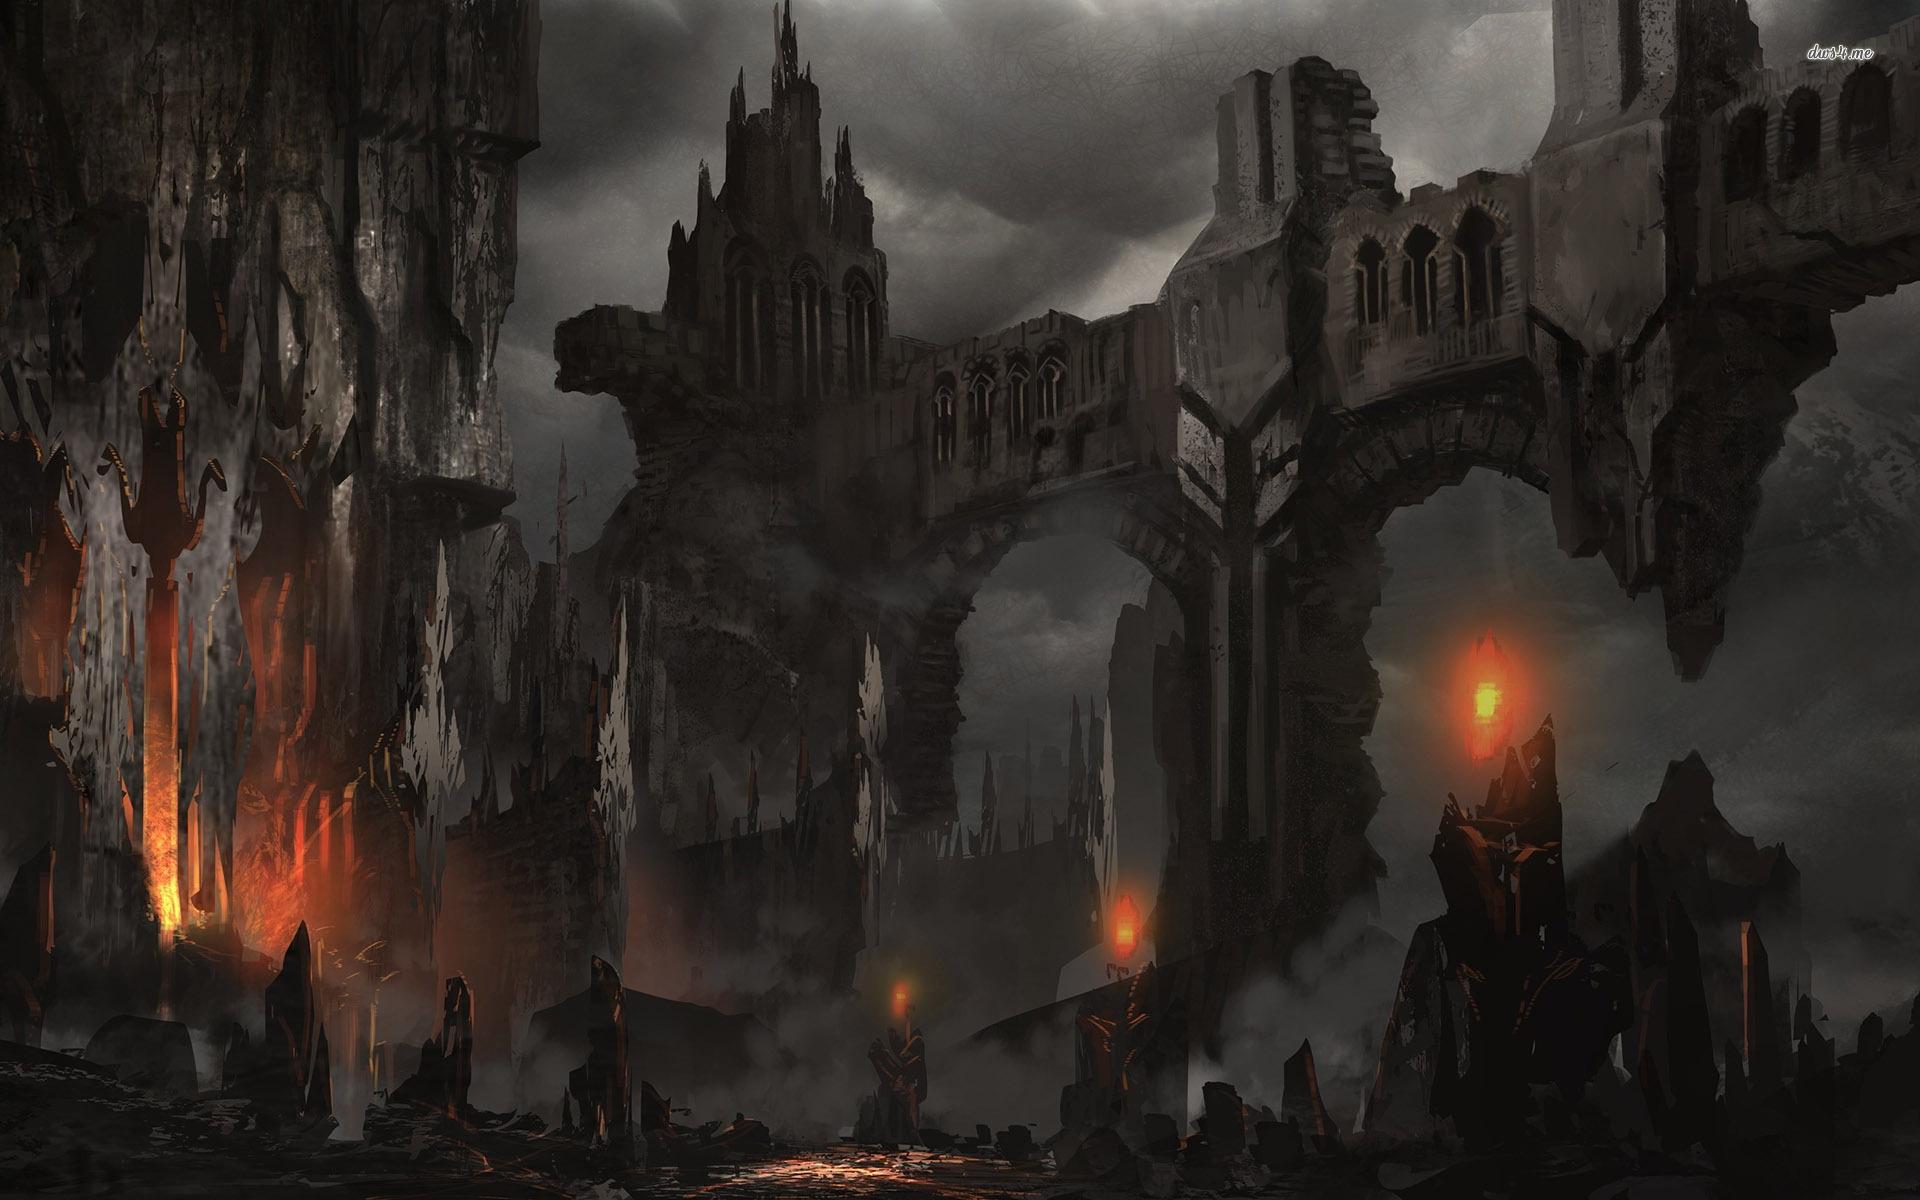 Fantasy Dark Castle Wallpaper Hd Background Wallpaper 16 HD